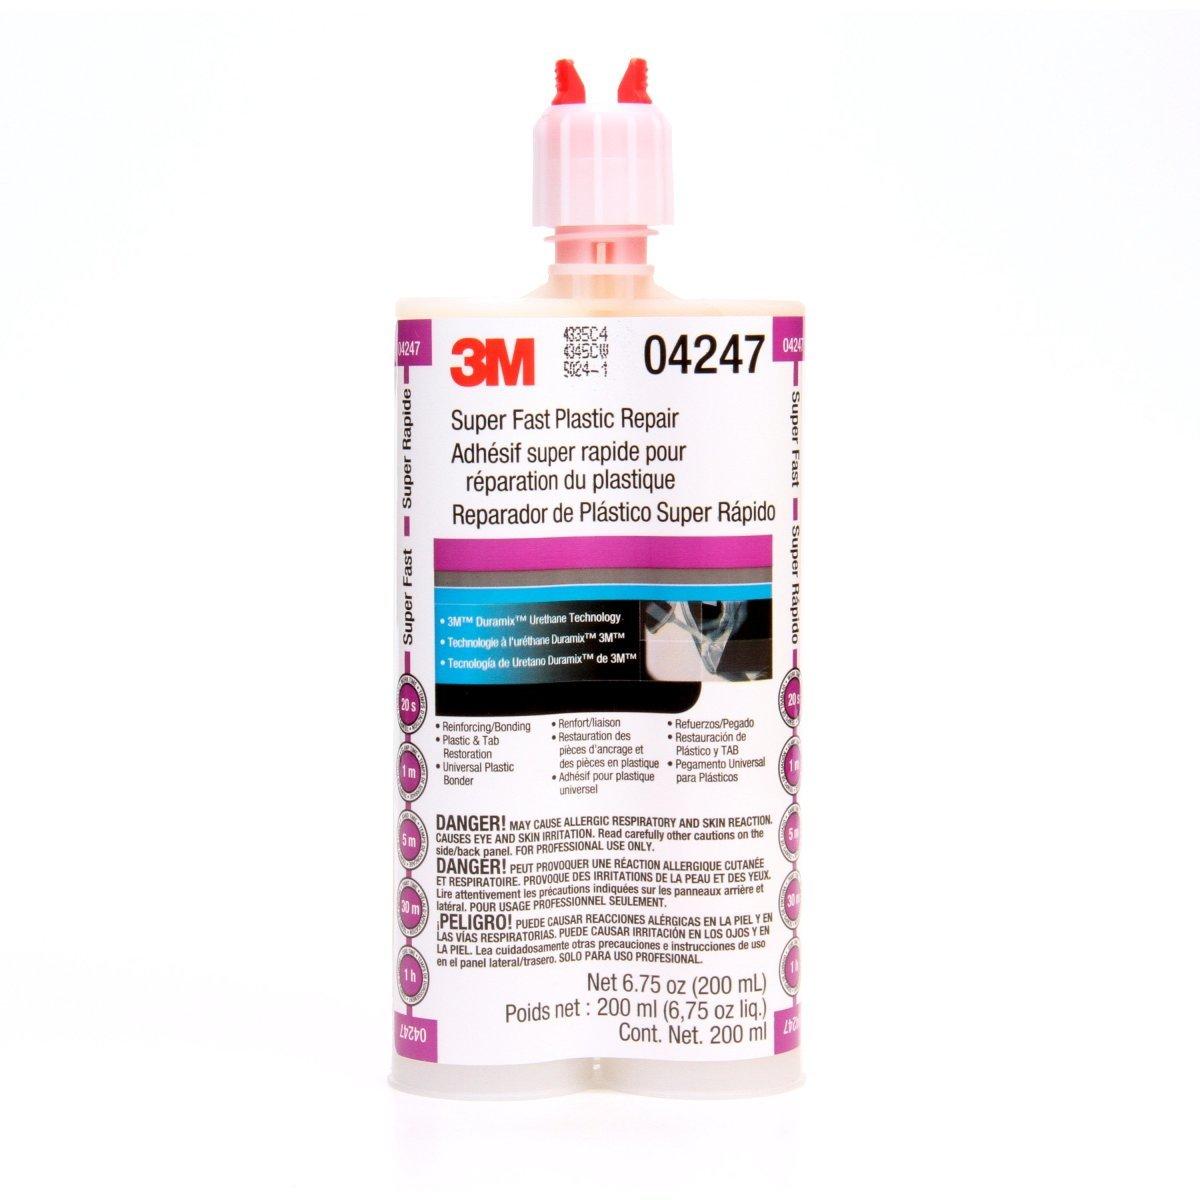 3M Duramix Clear Paste 200 ml Cartridge Super Fast Plastic Repair Adhesive